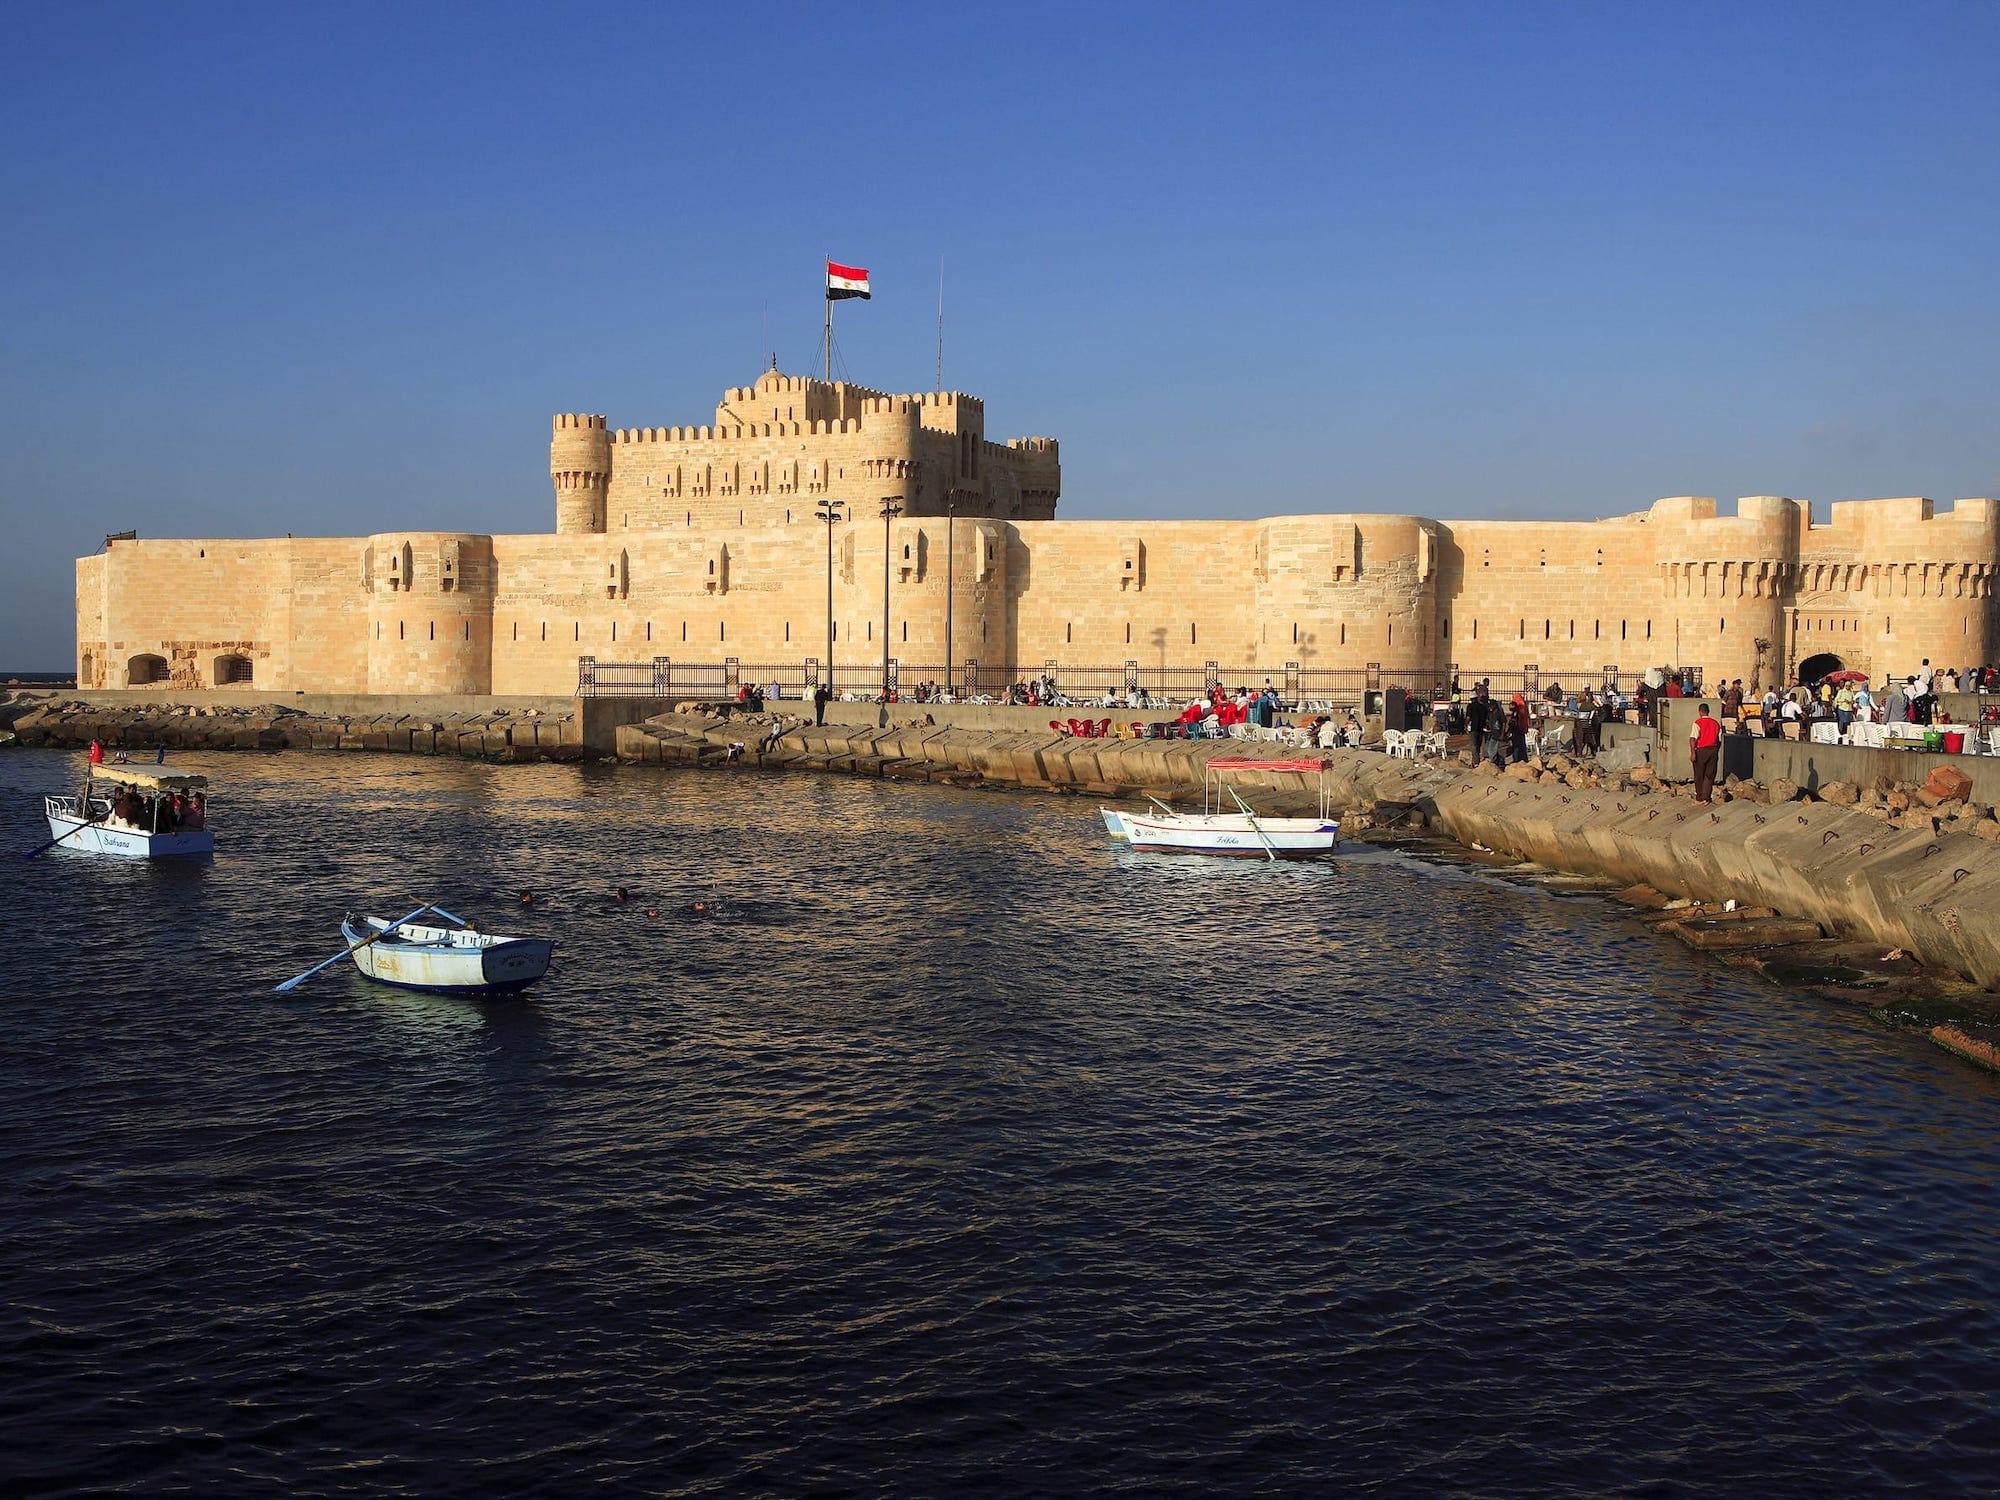 Is Alexandria worth visiting? Exploring Egypt's Mediterranean metropolis